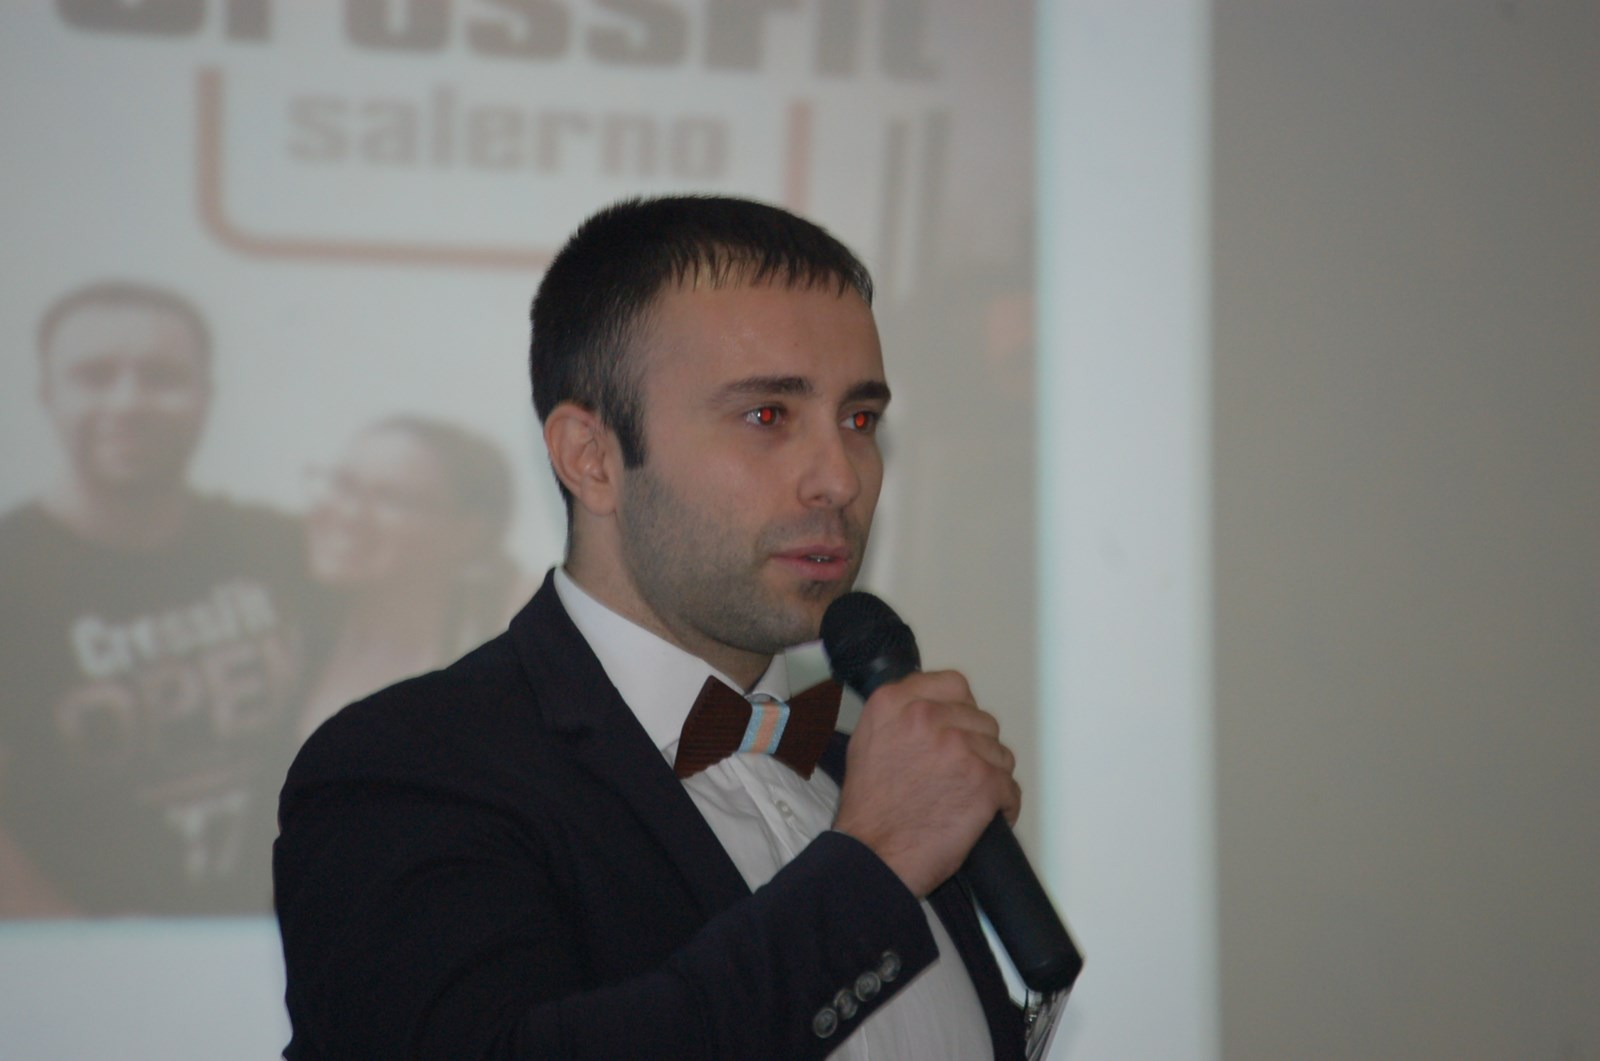 Michele Palladino